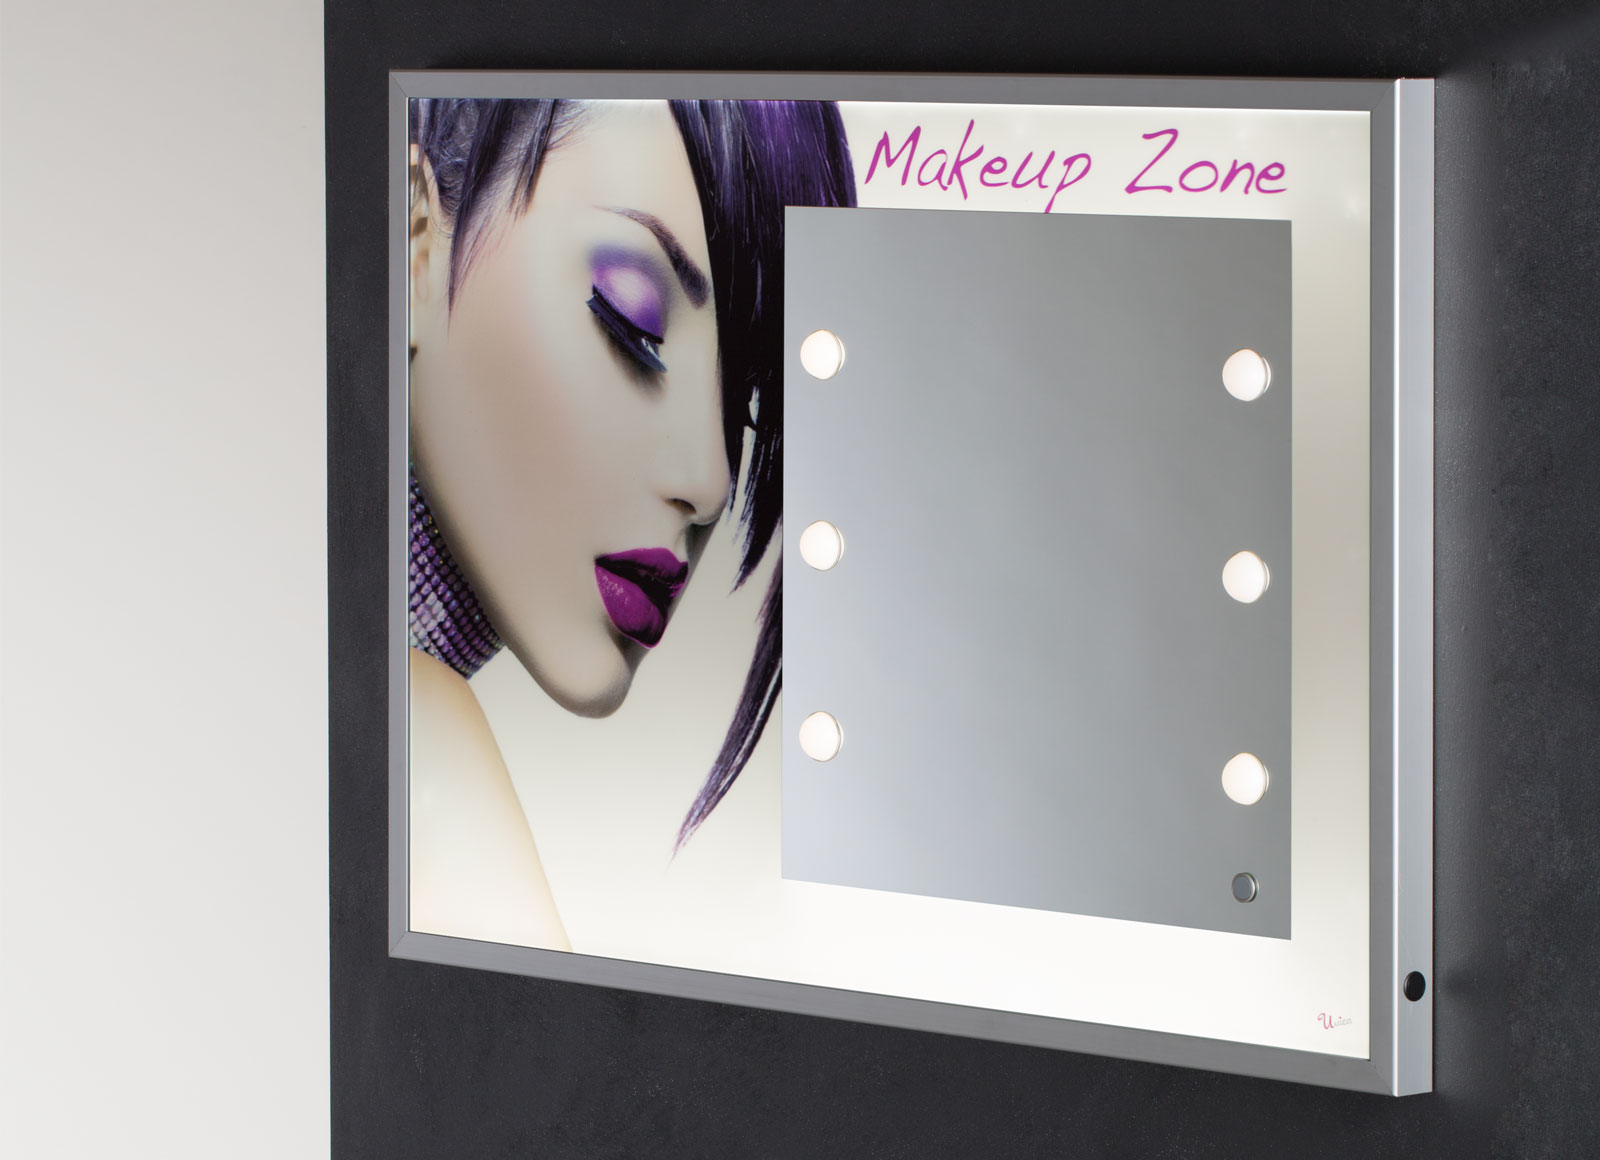 MPH backlit LED panel with I-light mirror